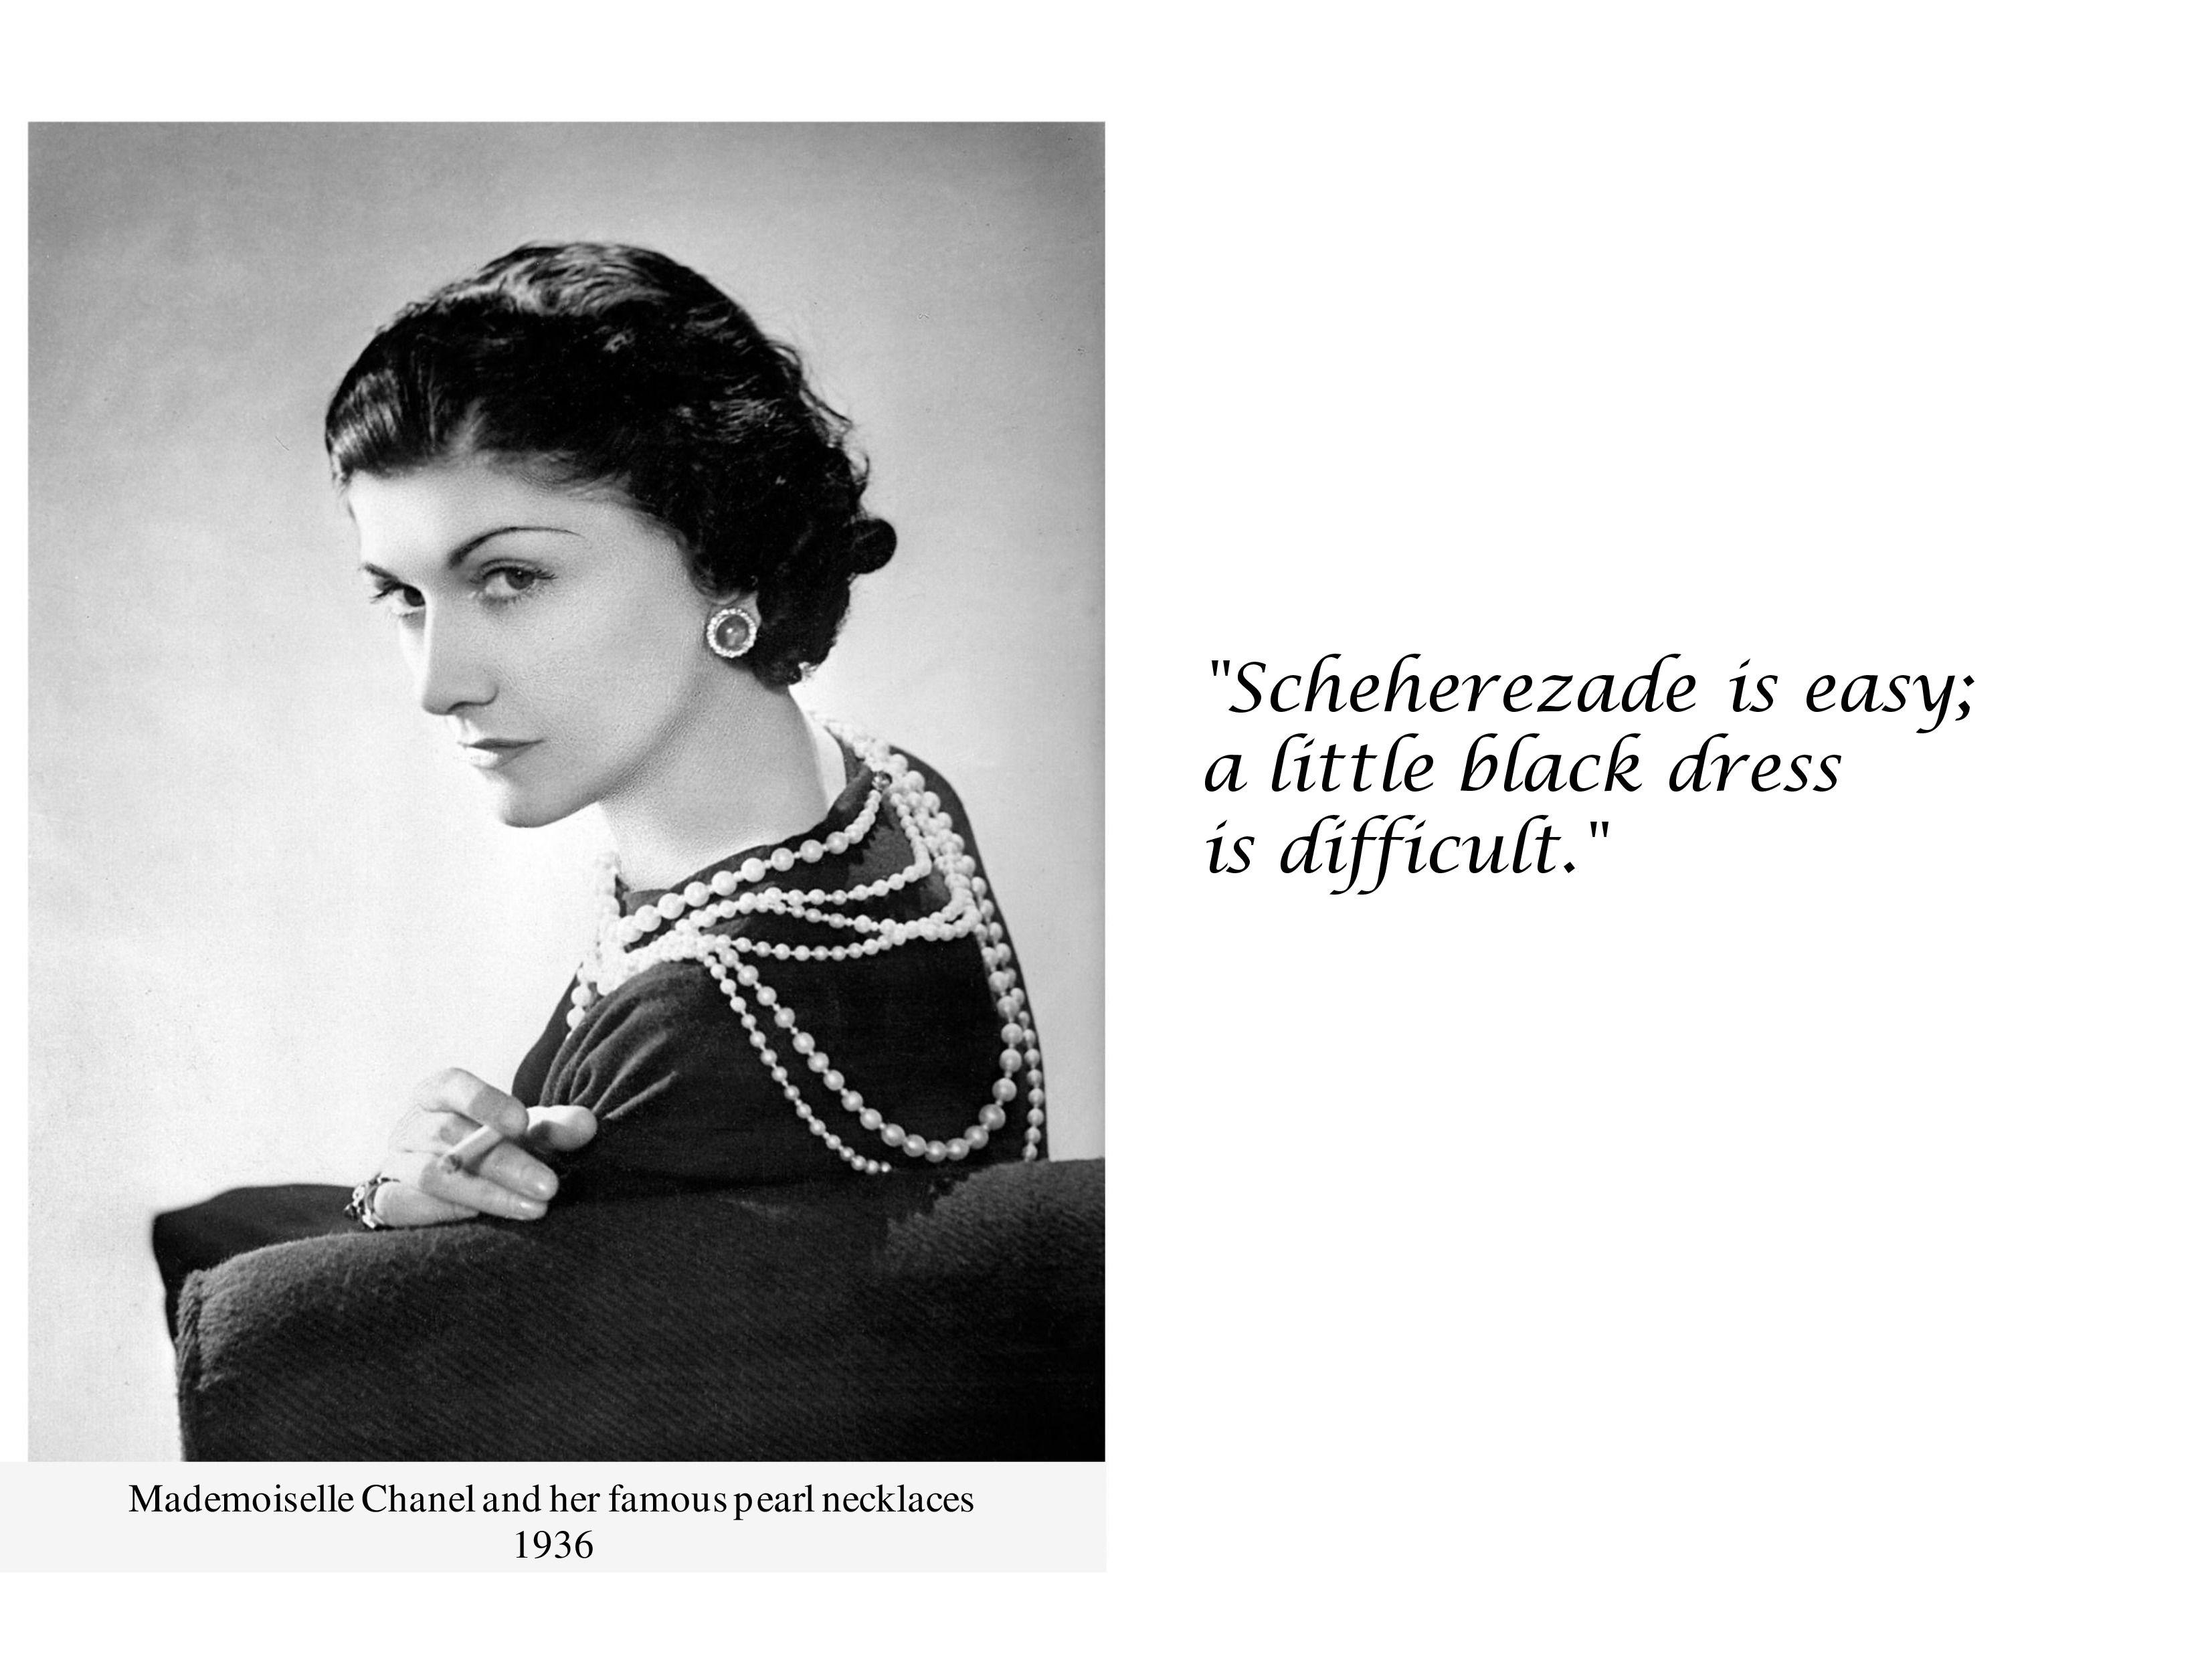 Scheherezade Is Easy A Little Black Dress Is Difficult Little Black Dress Black Dress Coco Chanel Quotes [ 2481 x 3306 Pixel ]